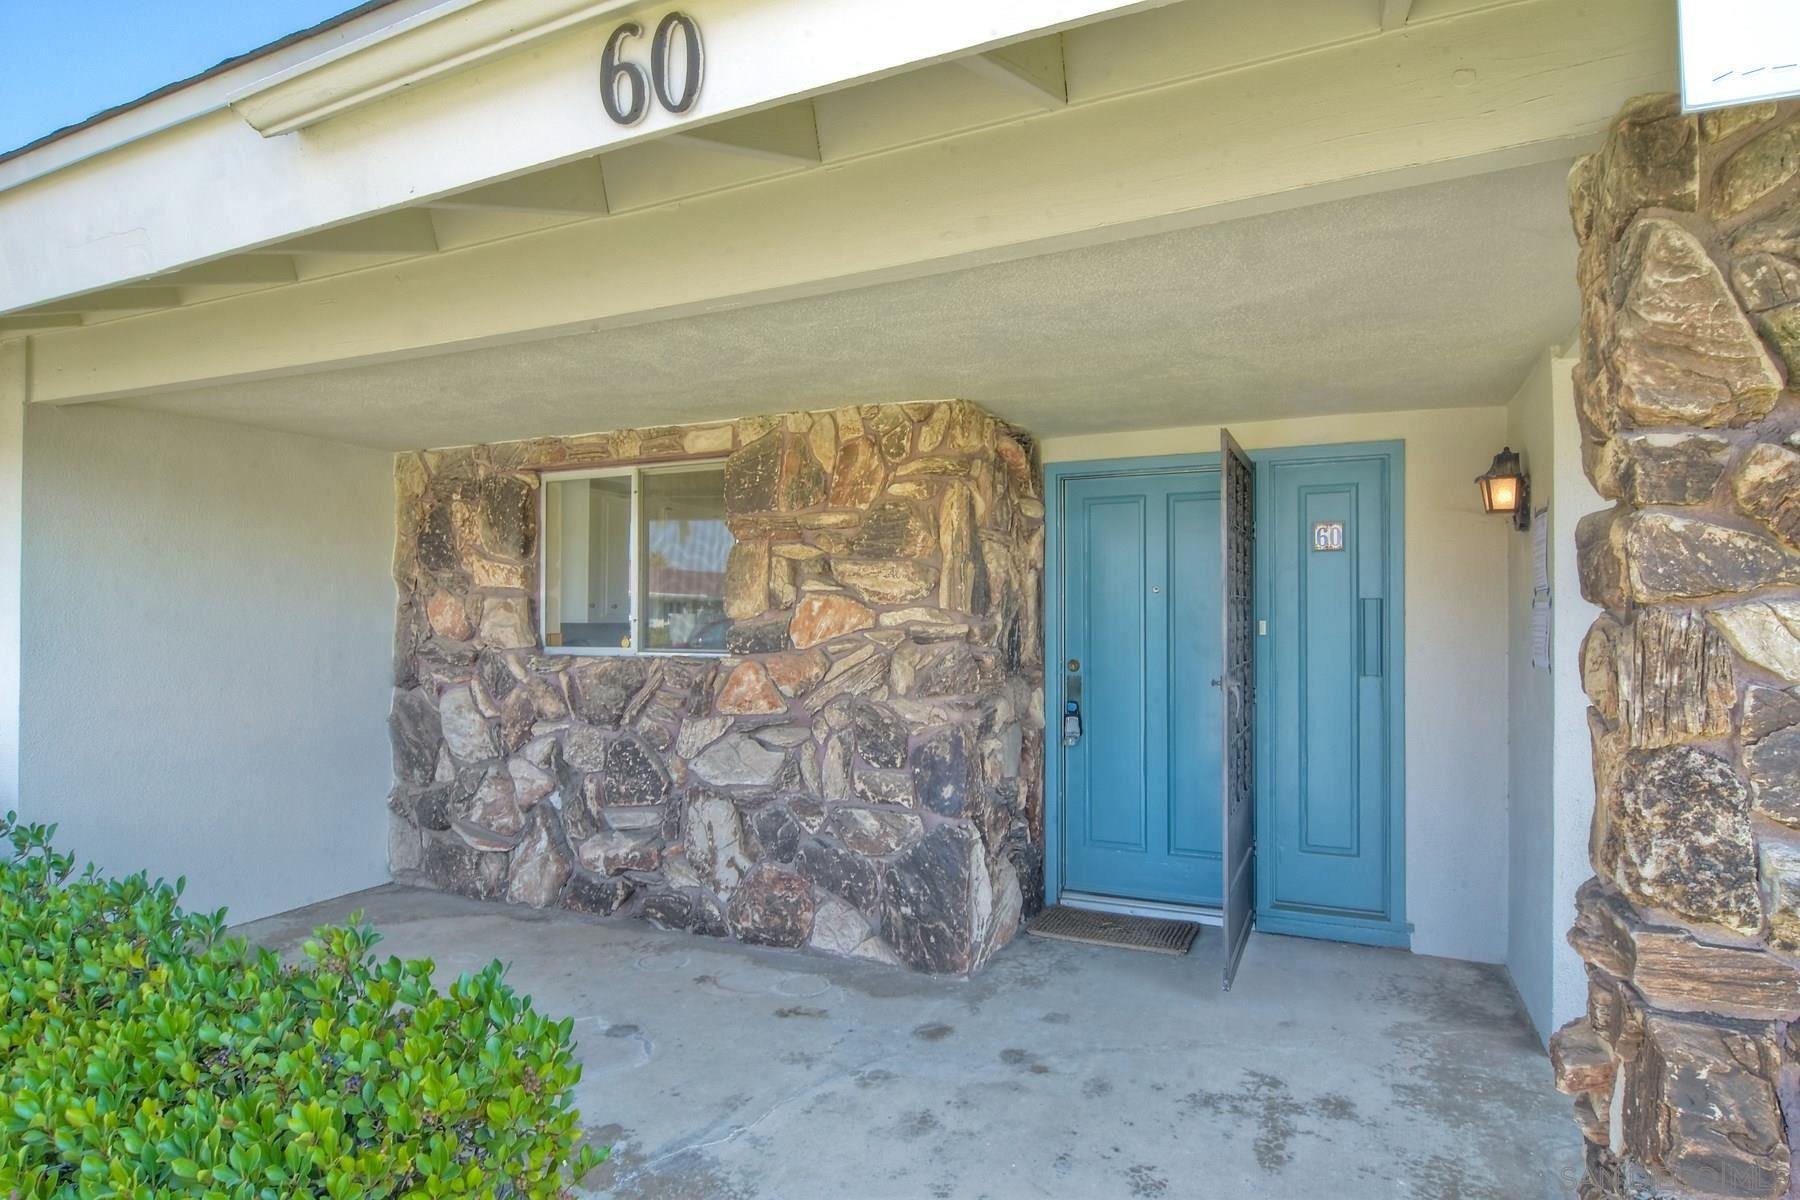 Photo of 3685 Vista Campana #60, Oceanside, CA 92057 (MLS # 210000514)